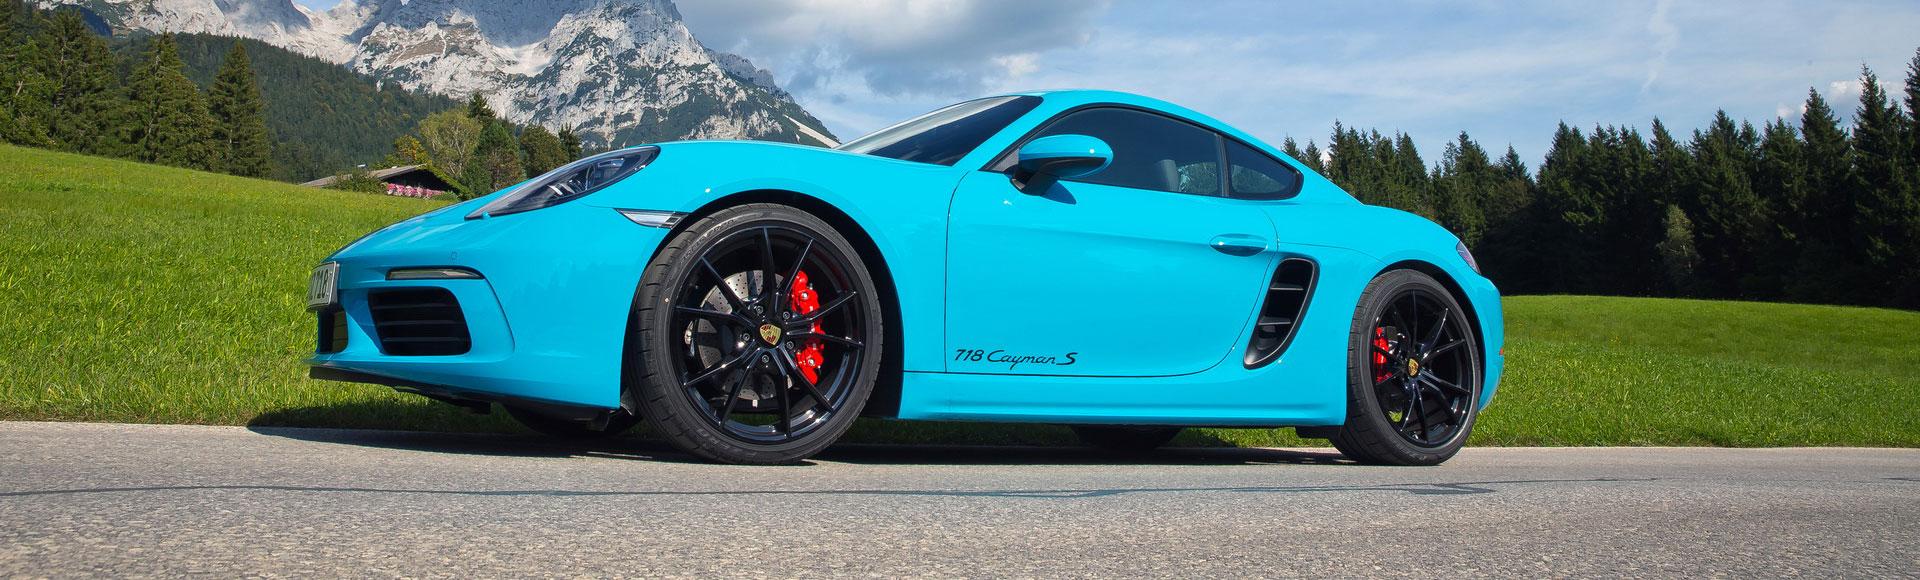 Porsche 718 Cayman 2016 069 Sommer